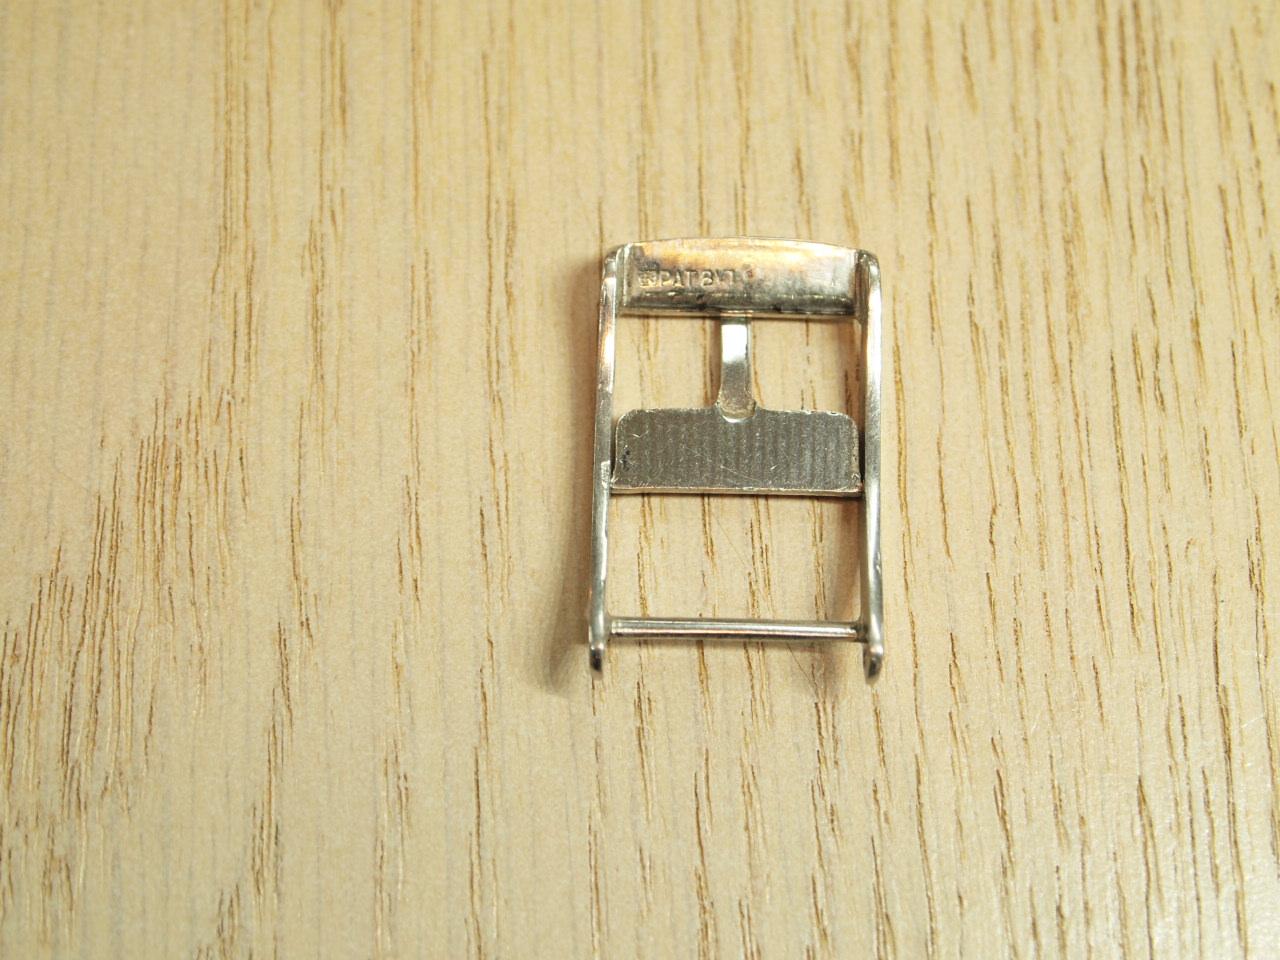 14 millimeters of OMEGA buckles